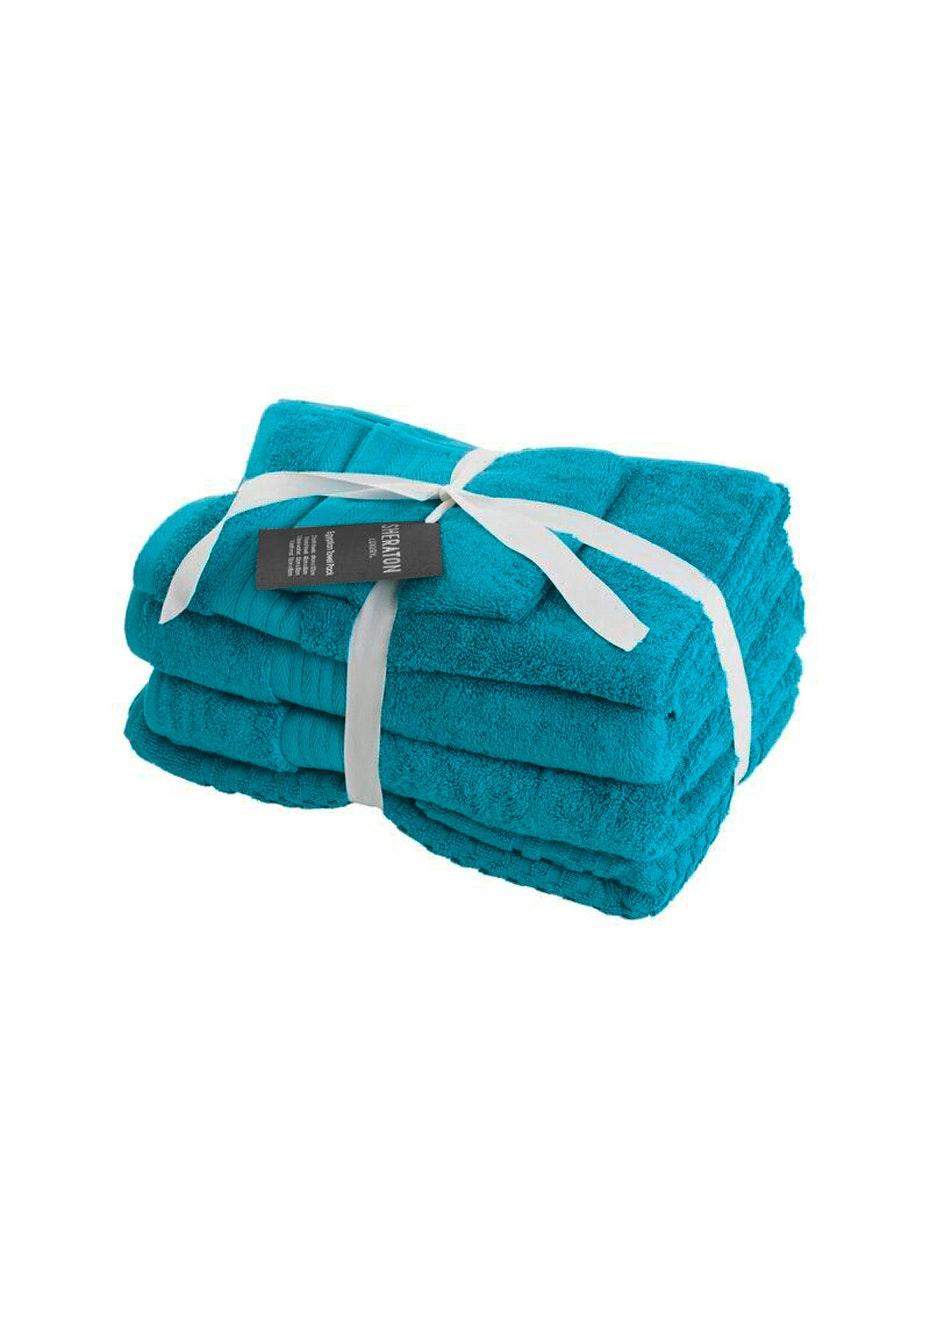 Sheraton Egptian 5 Piece Towel Pack - Colour Peacock